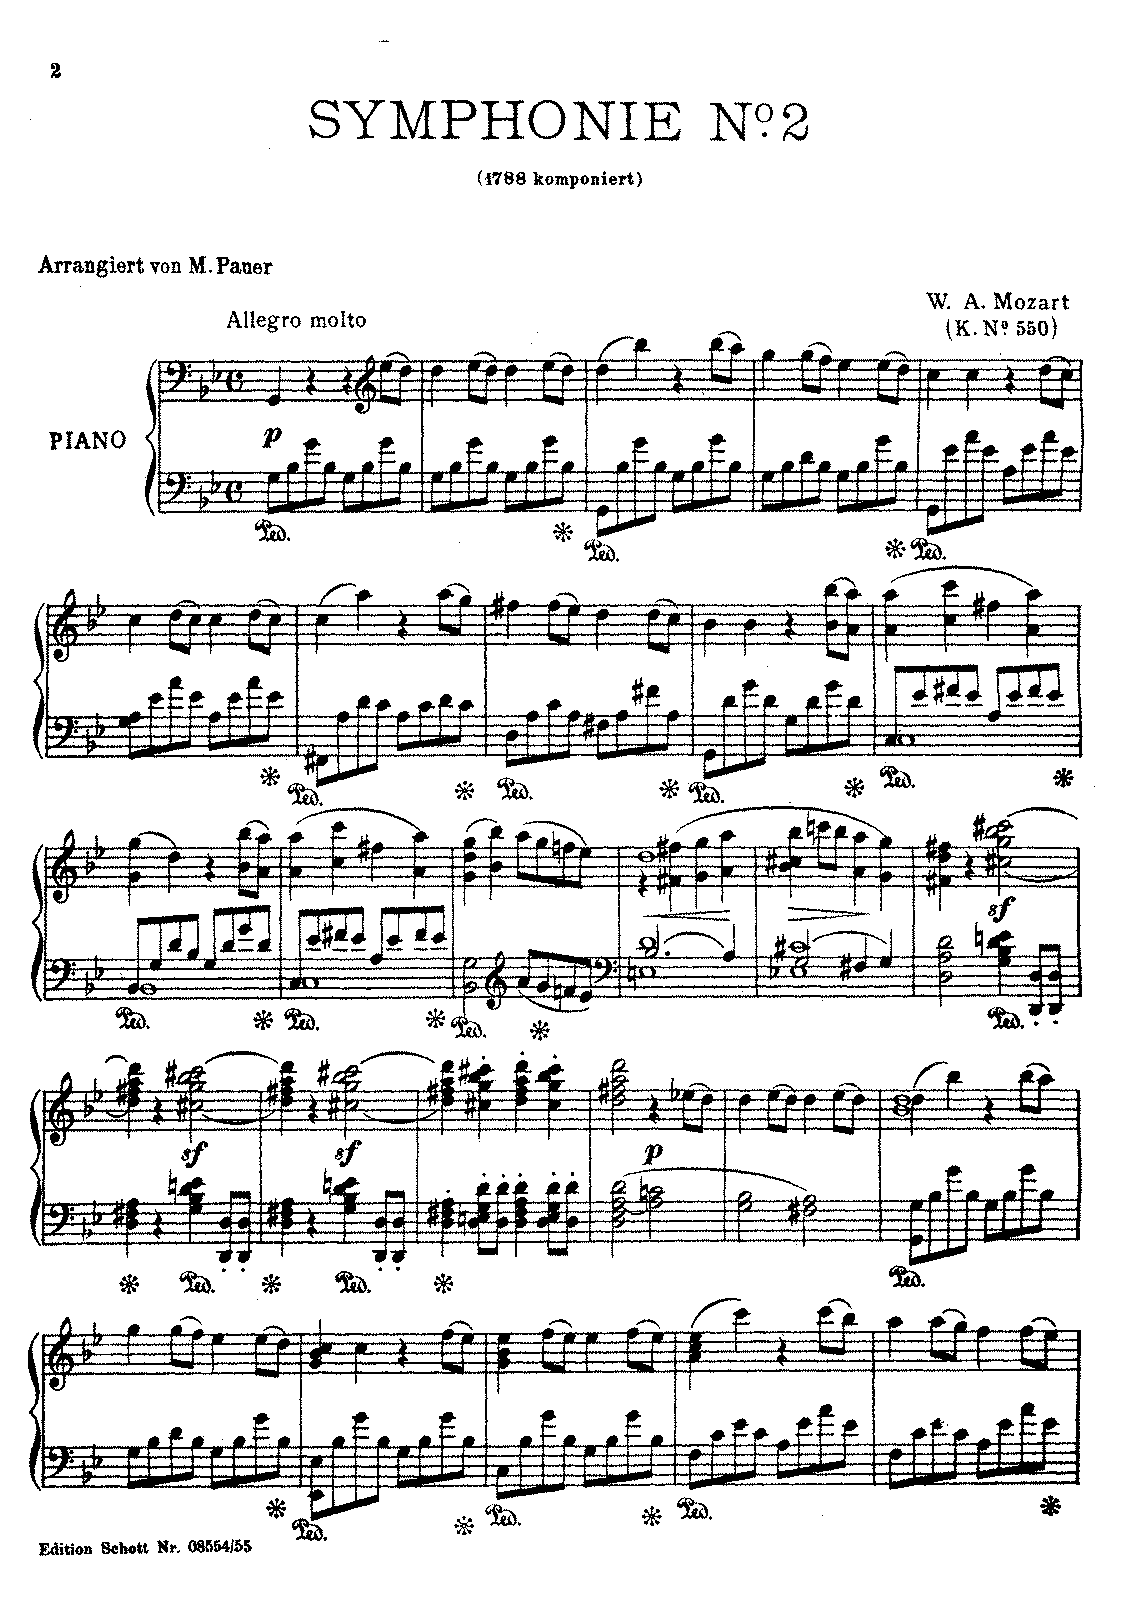 Wolfgang Amadeus Mozart: Symphony No. 40 in G Minor, K. 550